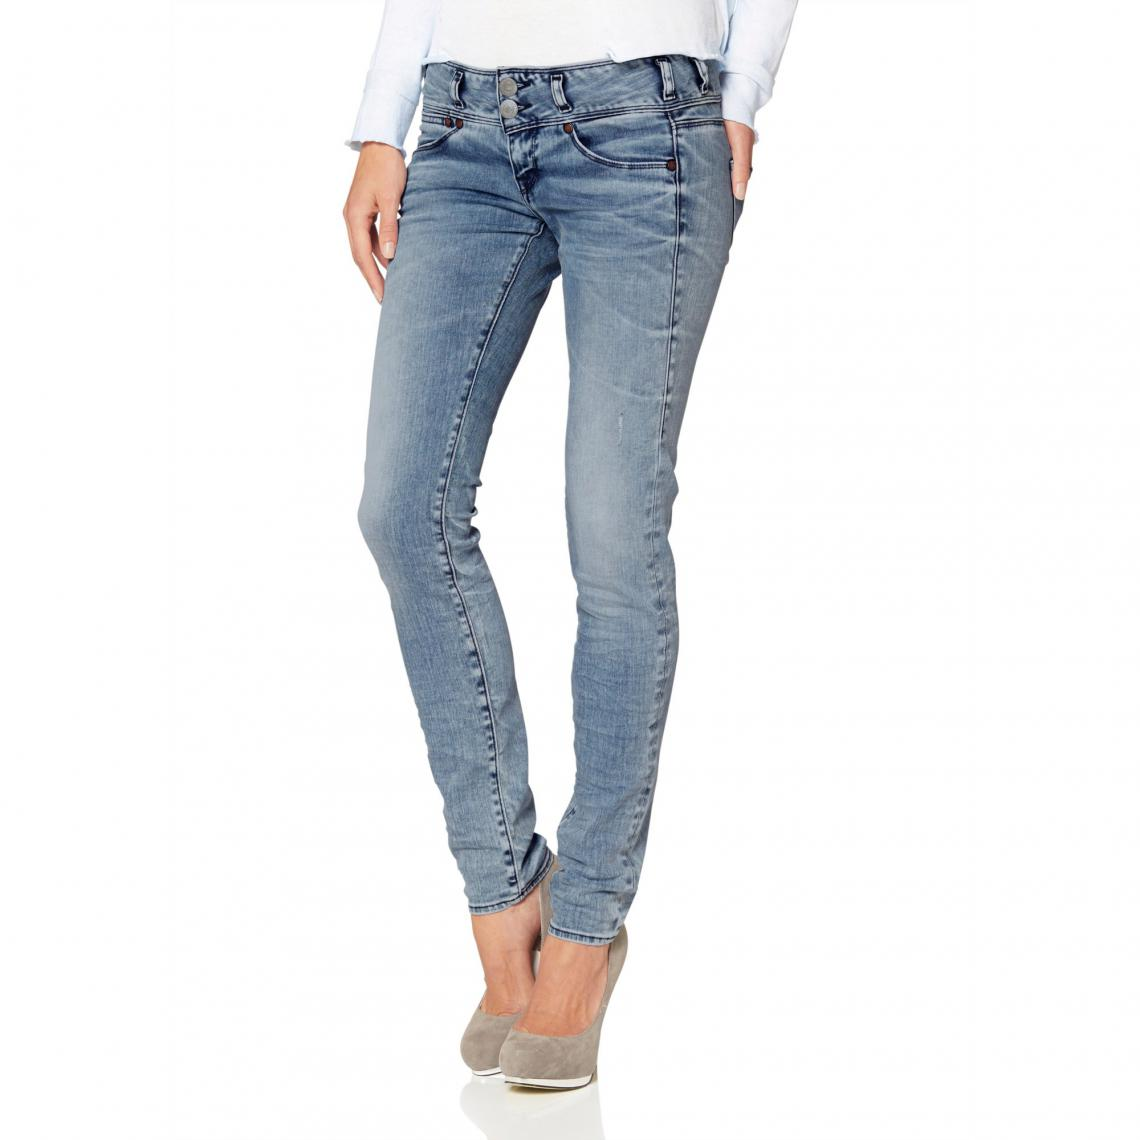 bd365a62dbbbf Jean skinny taille basse effet délavé femme Herrlicher - Bleu   3 ...